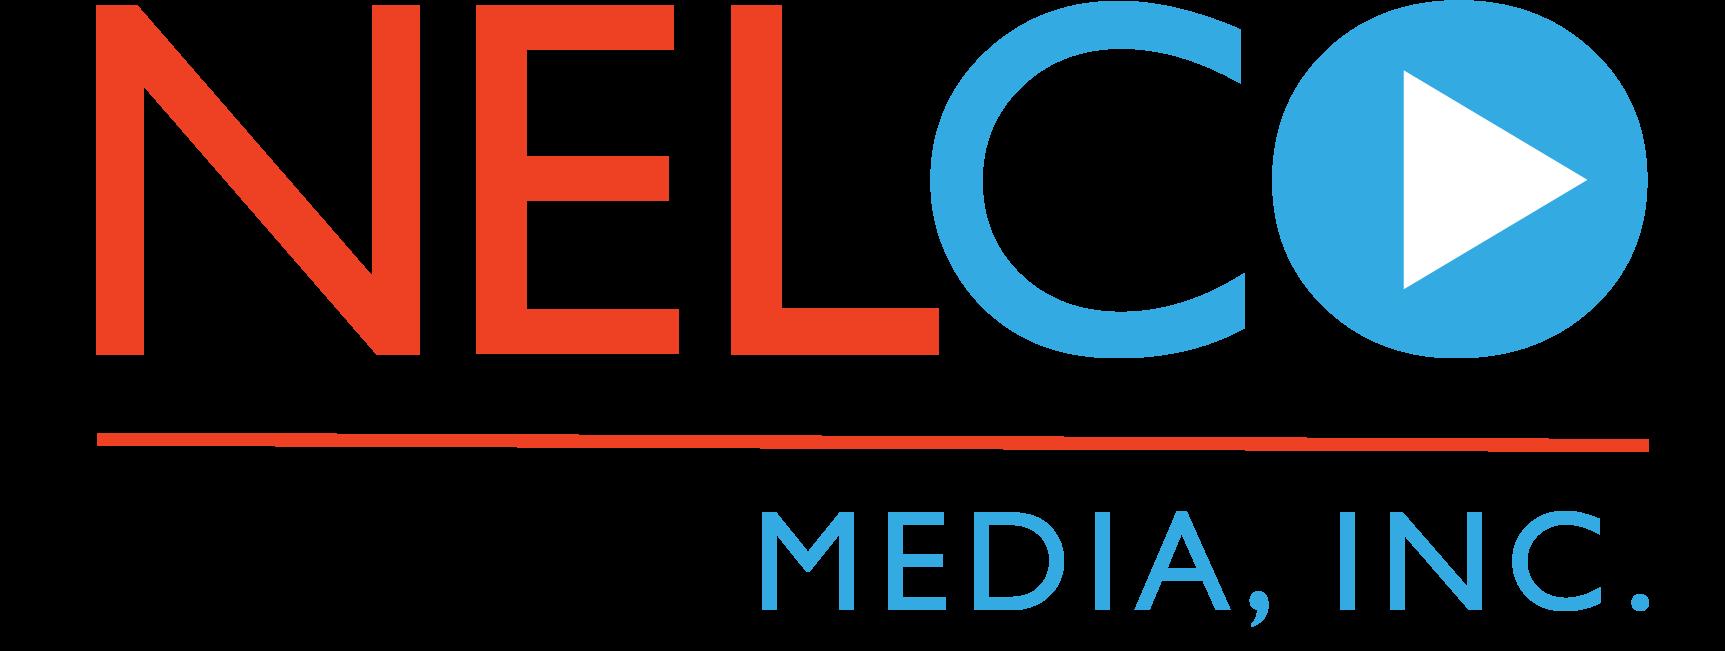 Nelco Media